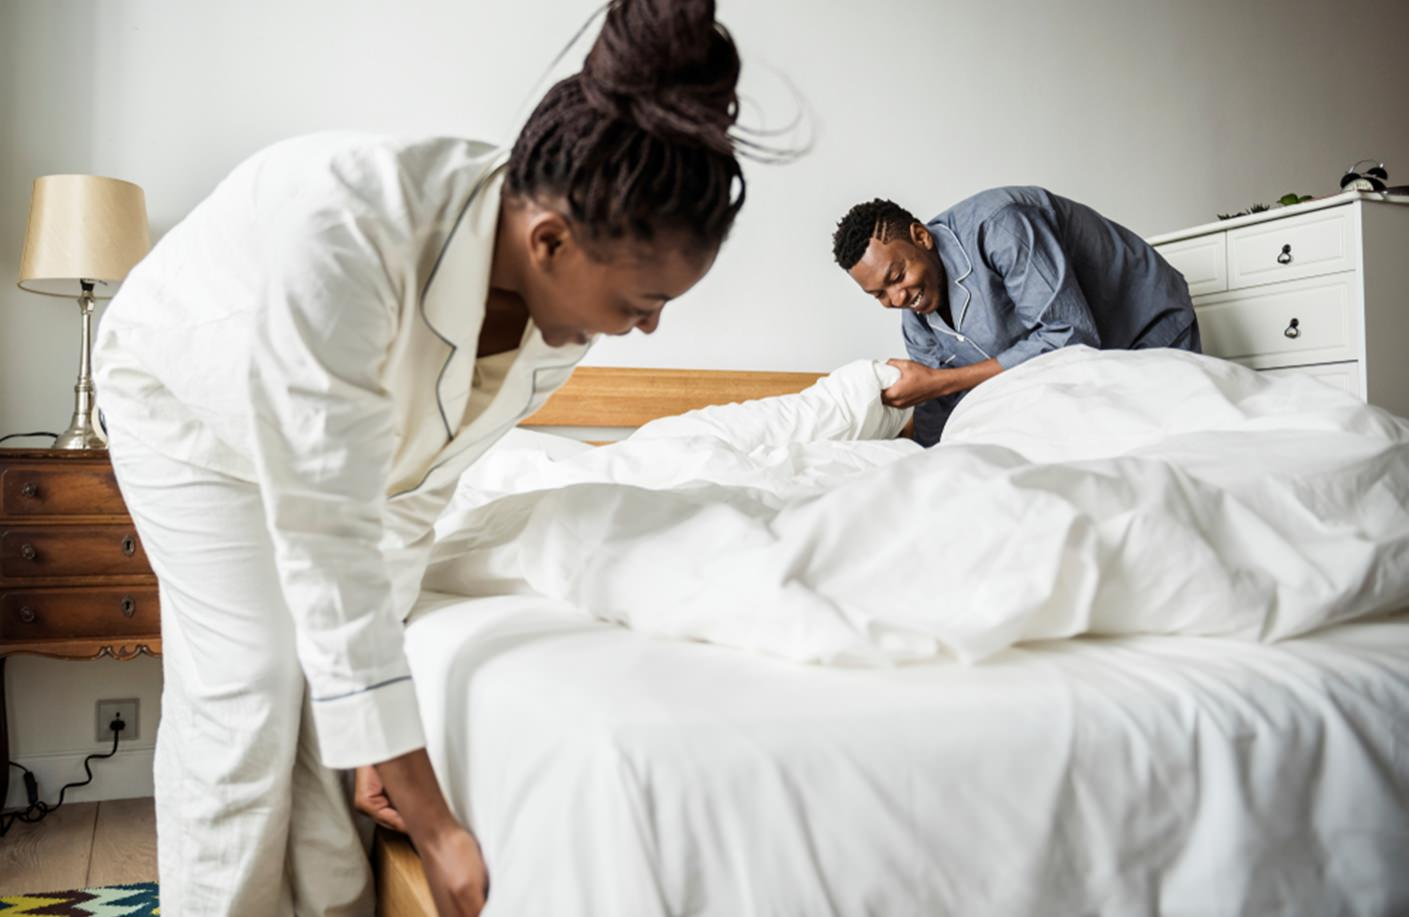 Arrumar a cama